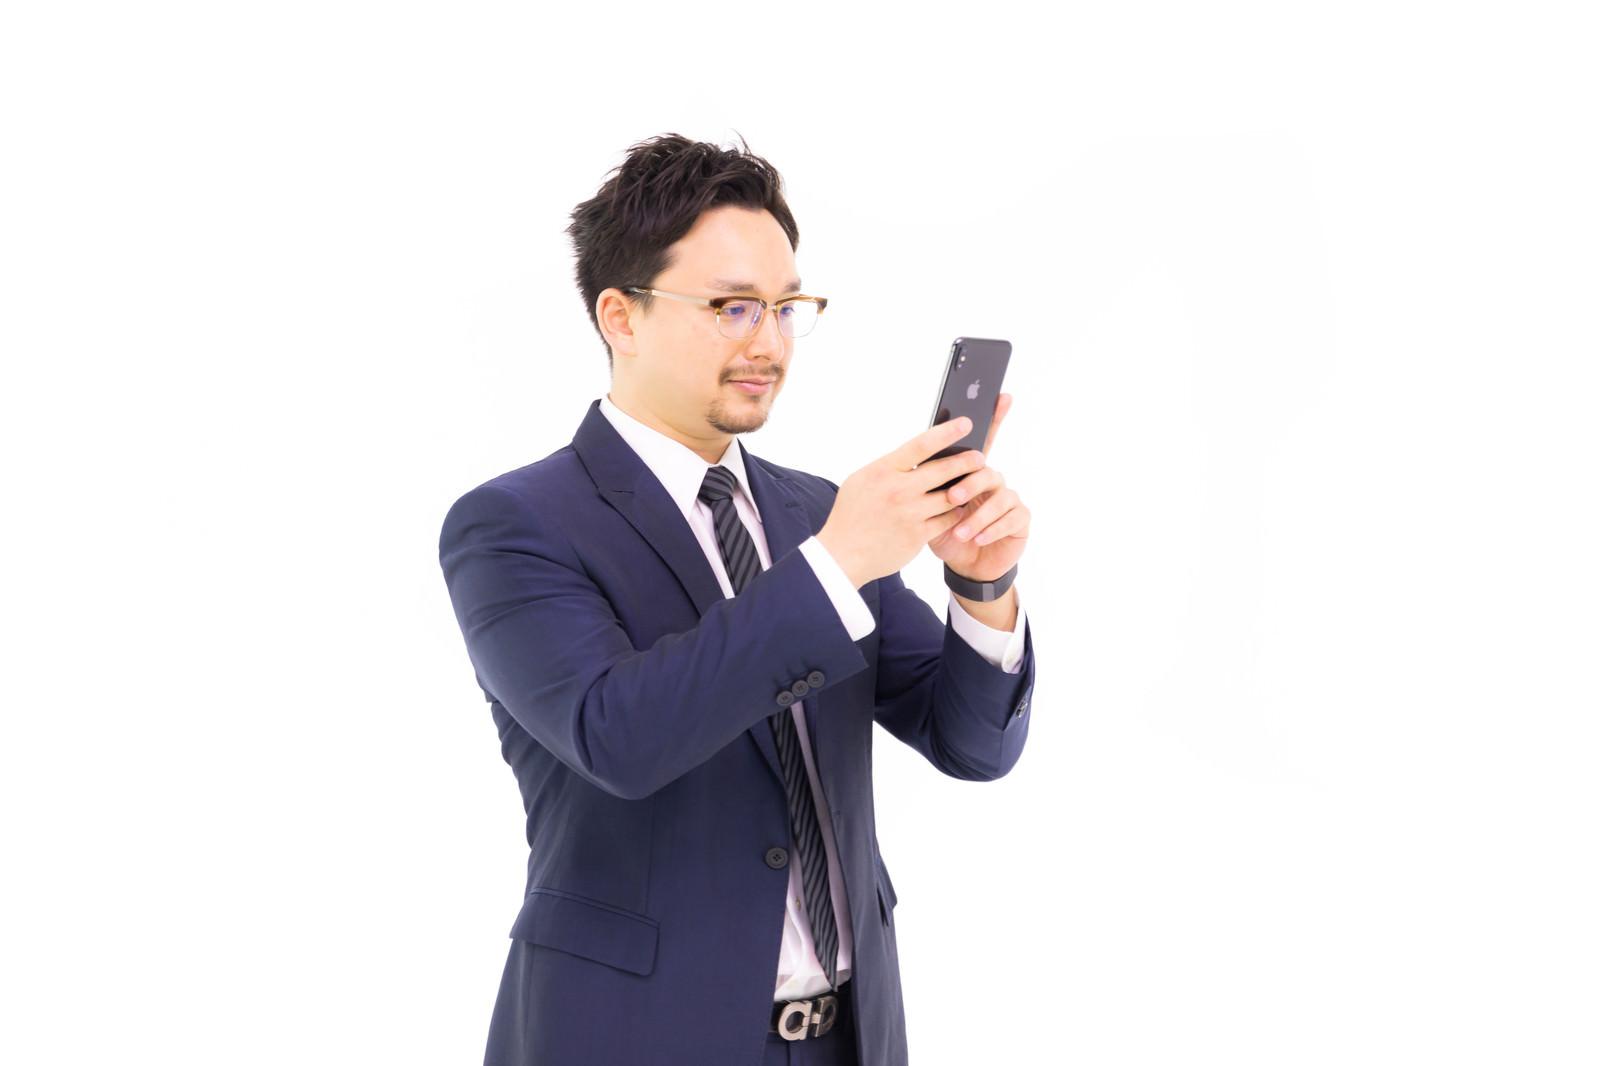 「iPhone XS Max を弄るドイツ人ハーフ」の写真[モデル:Max_Ezaki]